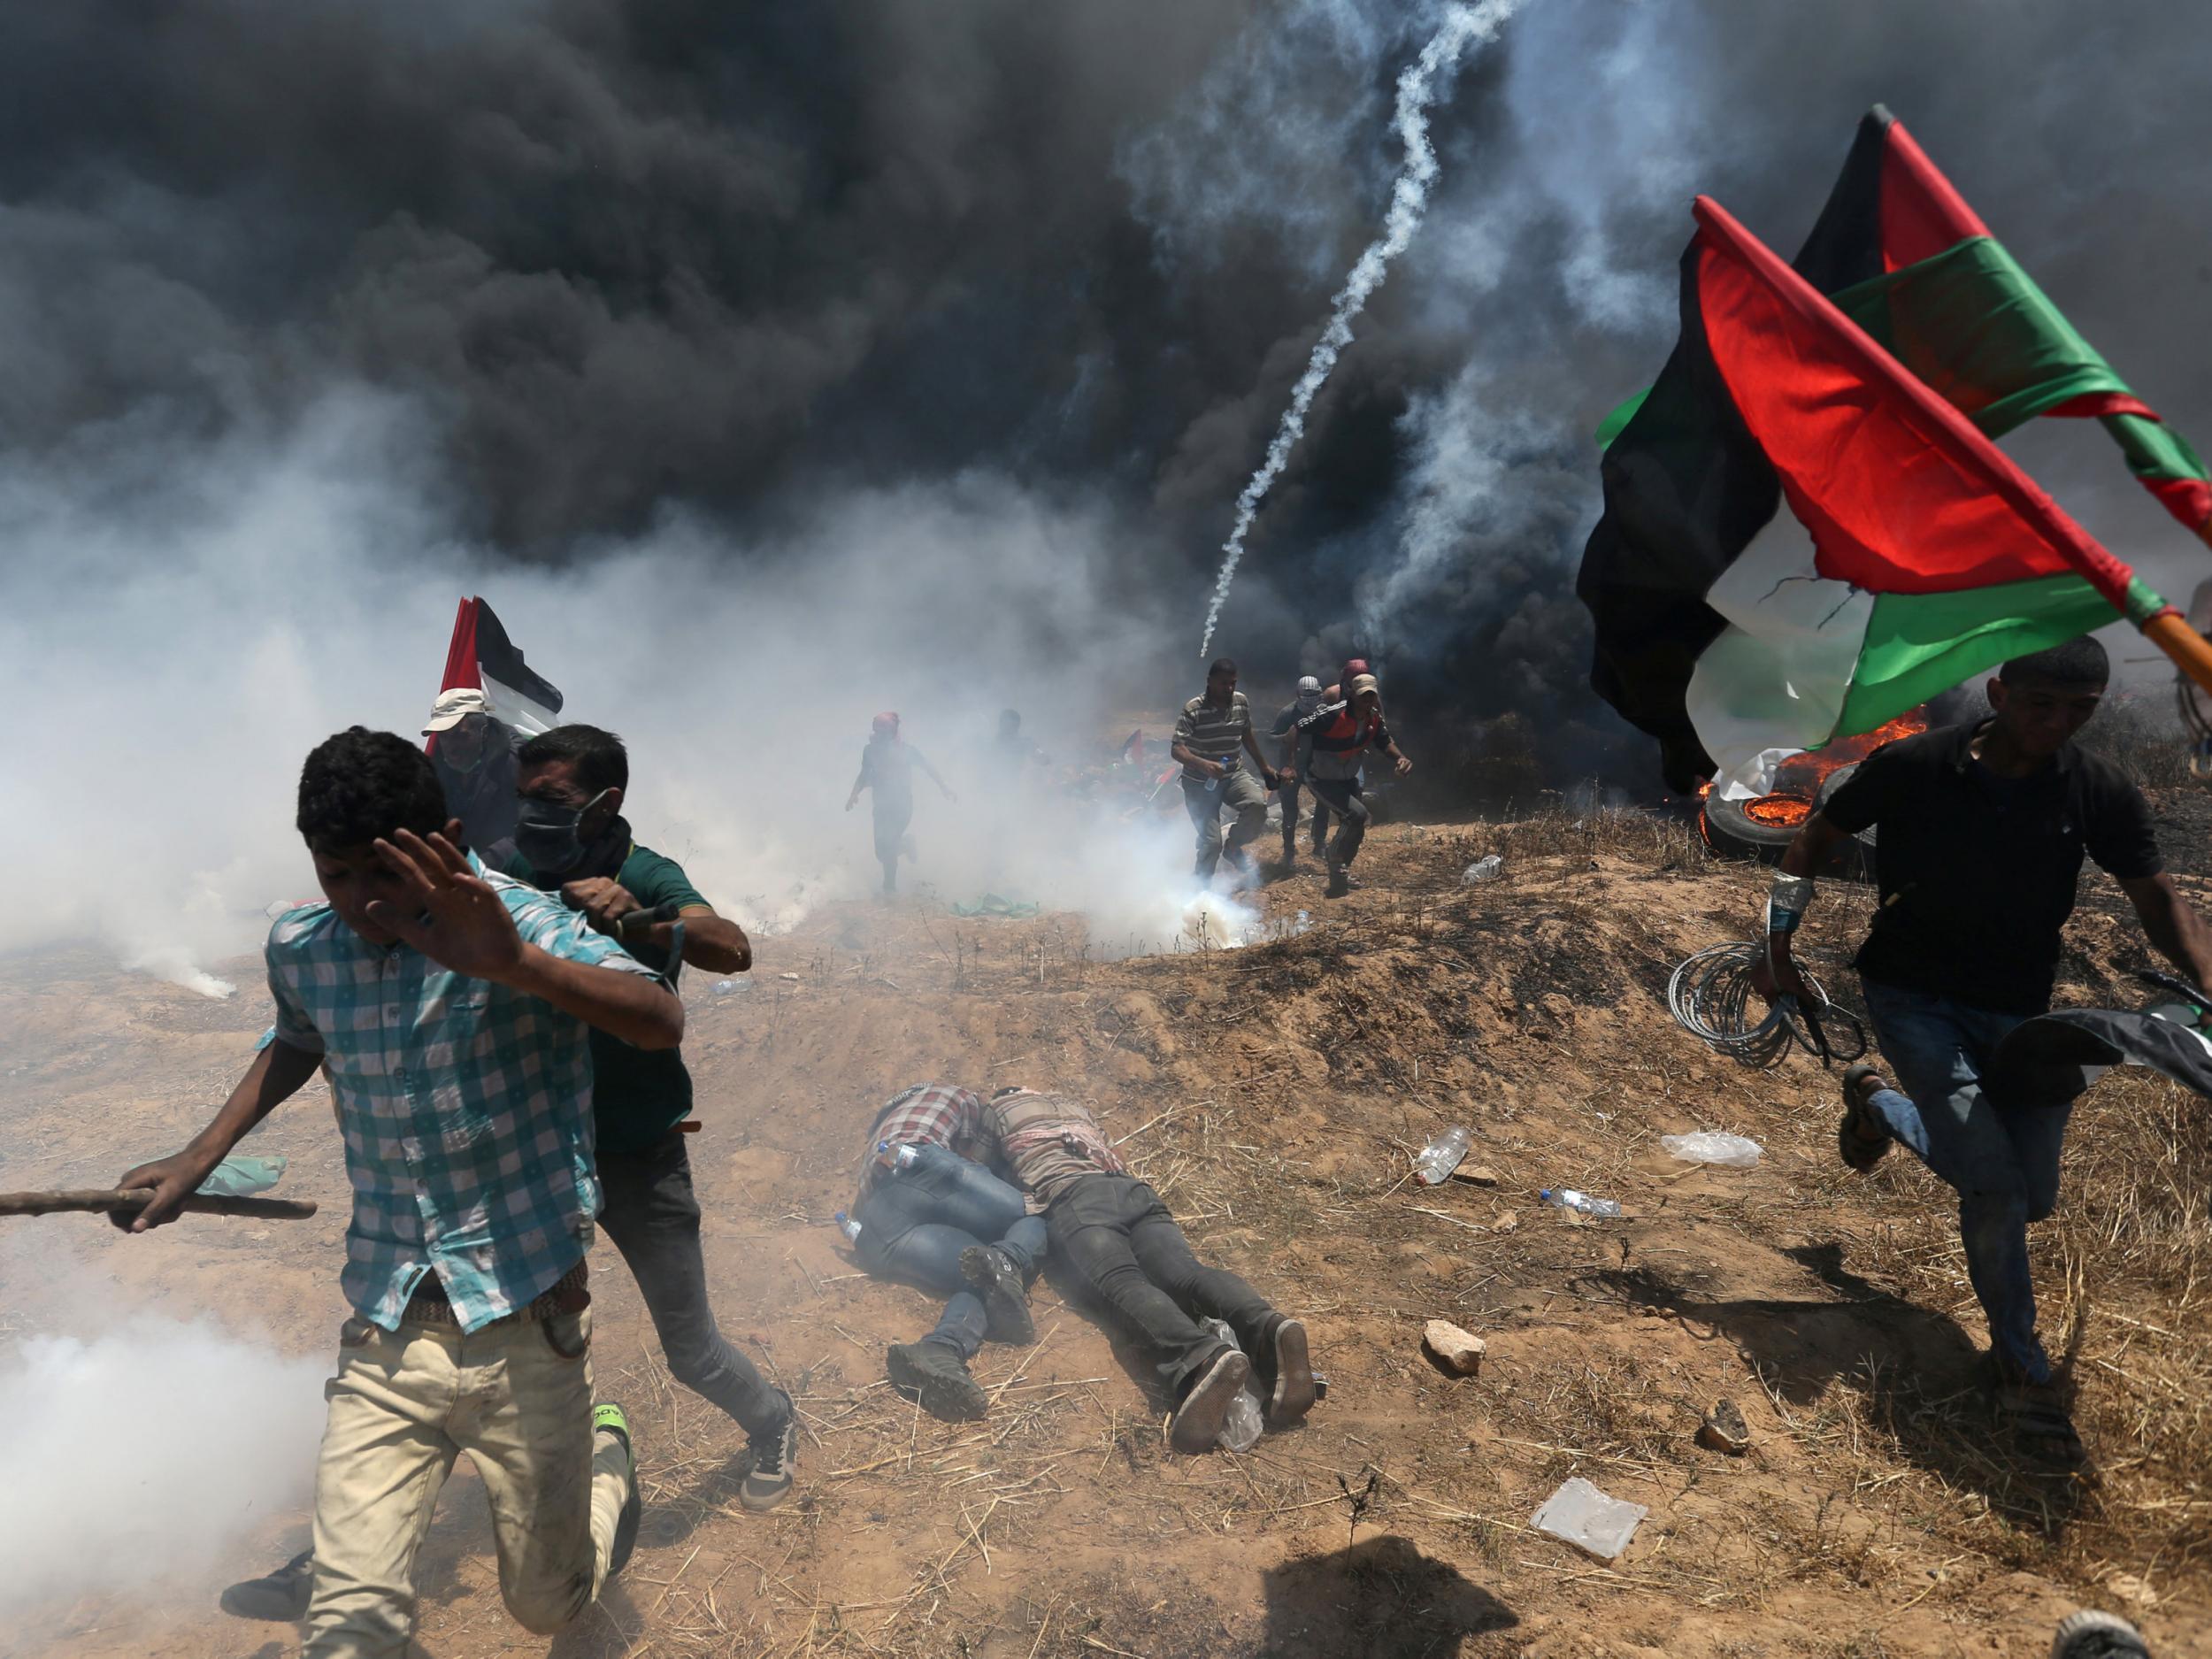 https://static.independent.co.uk/s3fs-public/thumbnails/image/2018/05/14/12/palestine-return-12.jpg